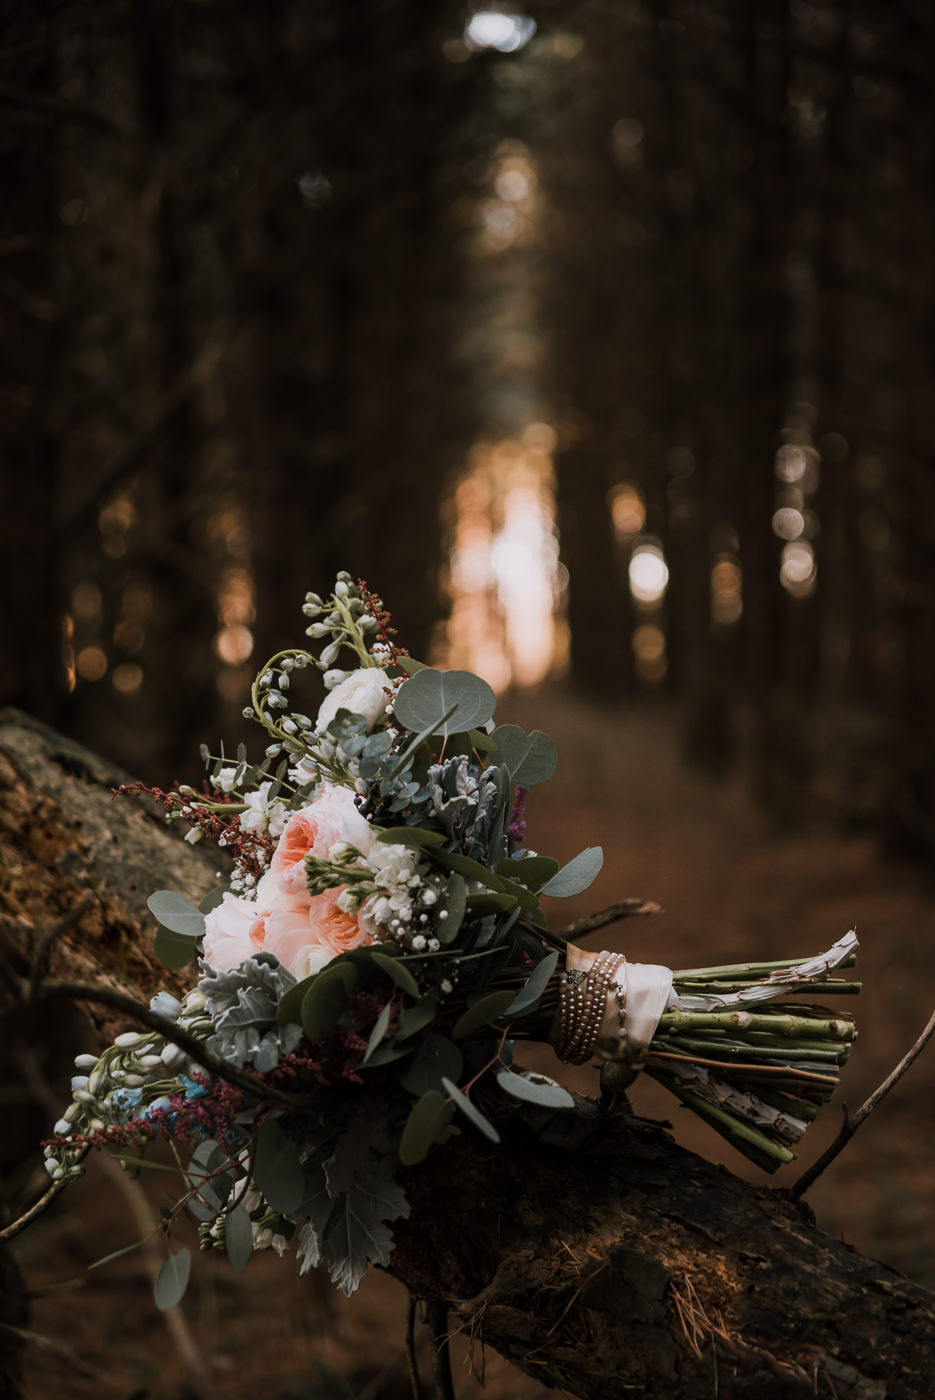 rogers.arkansas.weddingphotos.©2018mileswittboyer-18.jpg